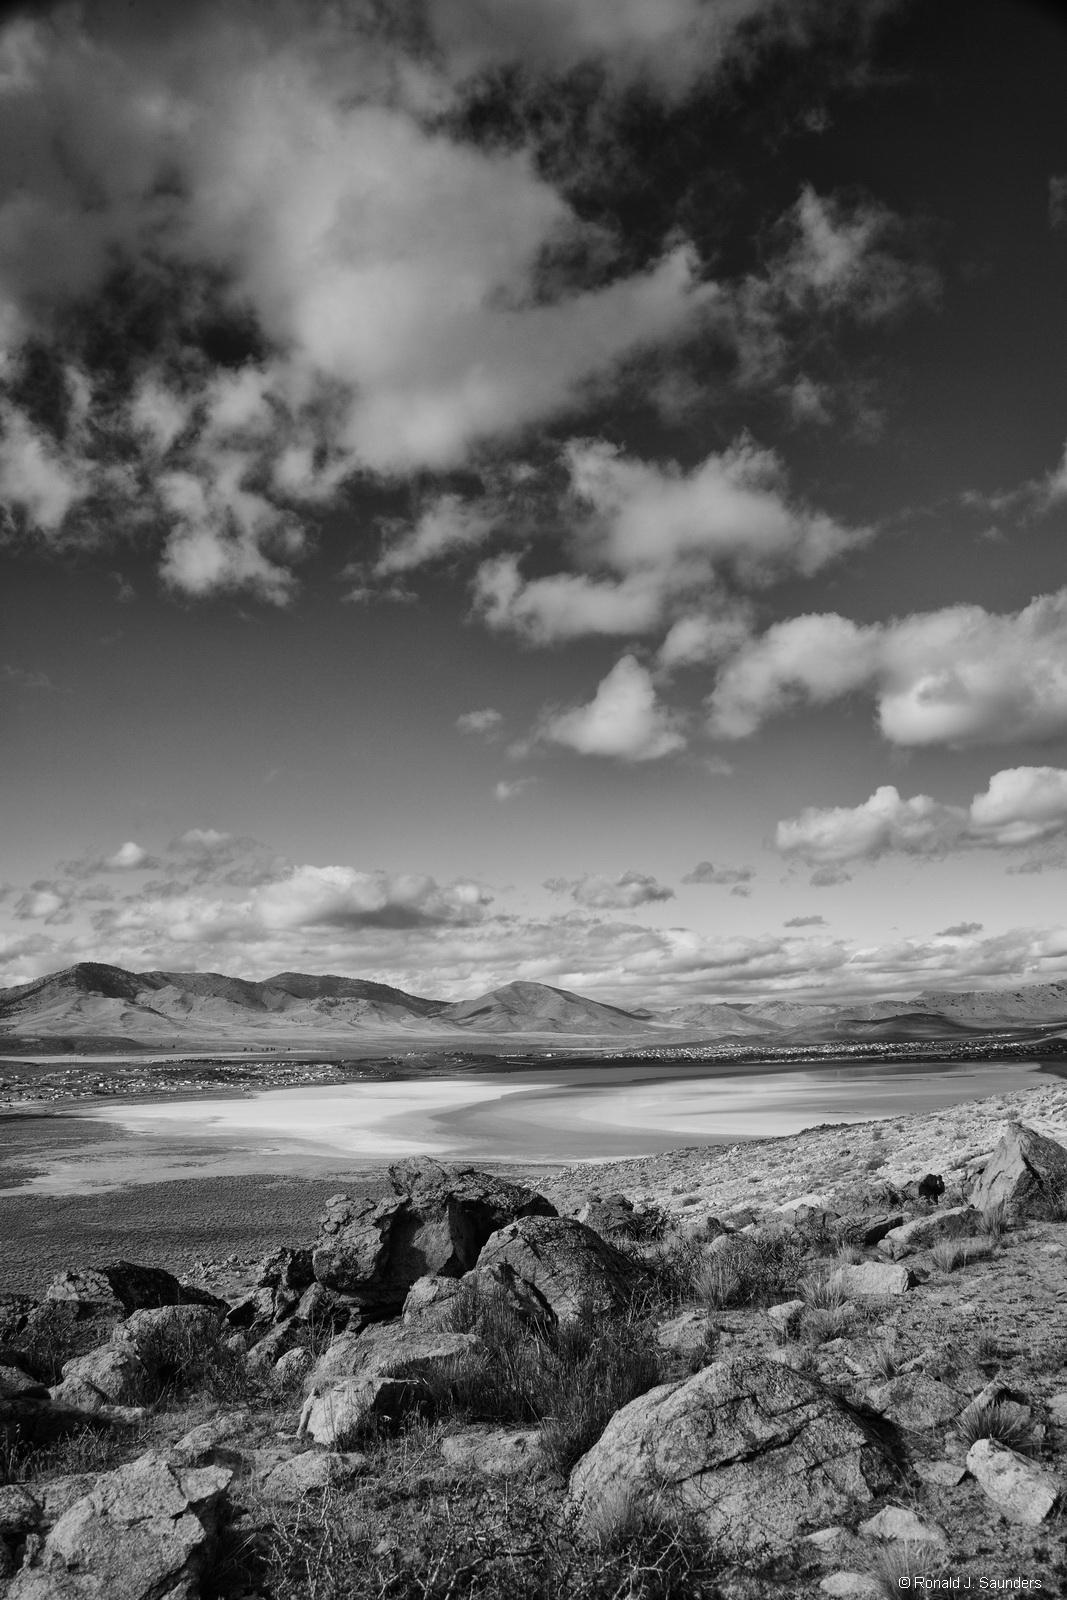 ron, saunders, ronald, ronald j saunders, landscape, photography, nevada, california, image, black, white, exhibition, desert, black rock, mountain, photography, photo